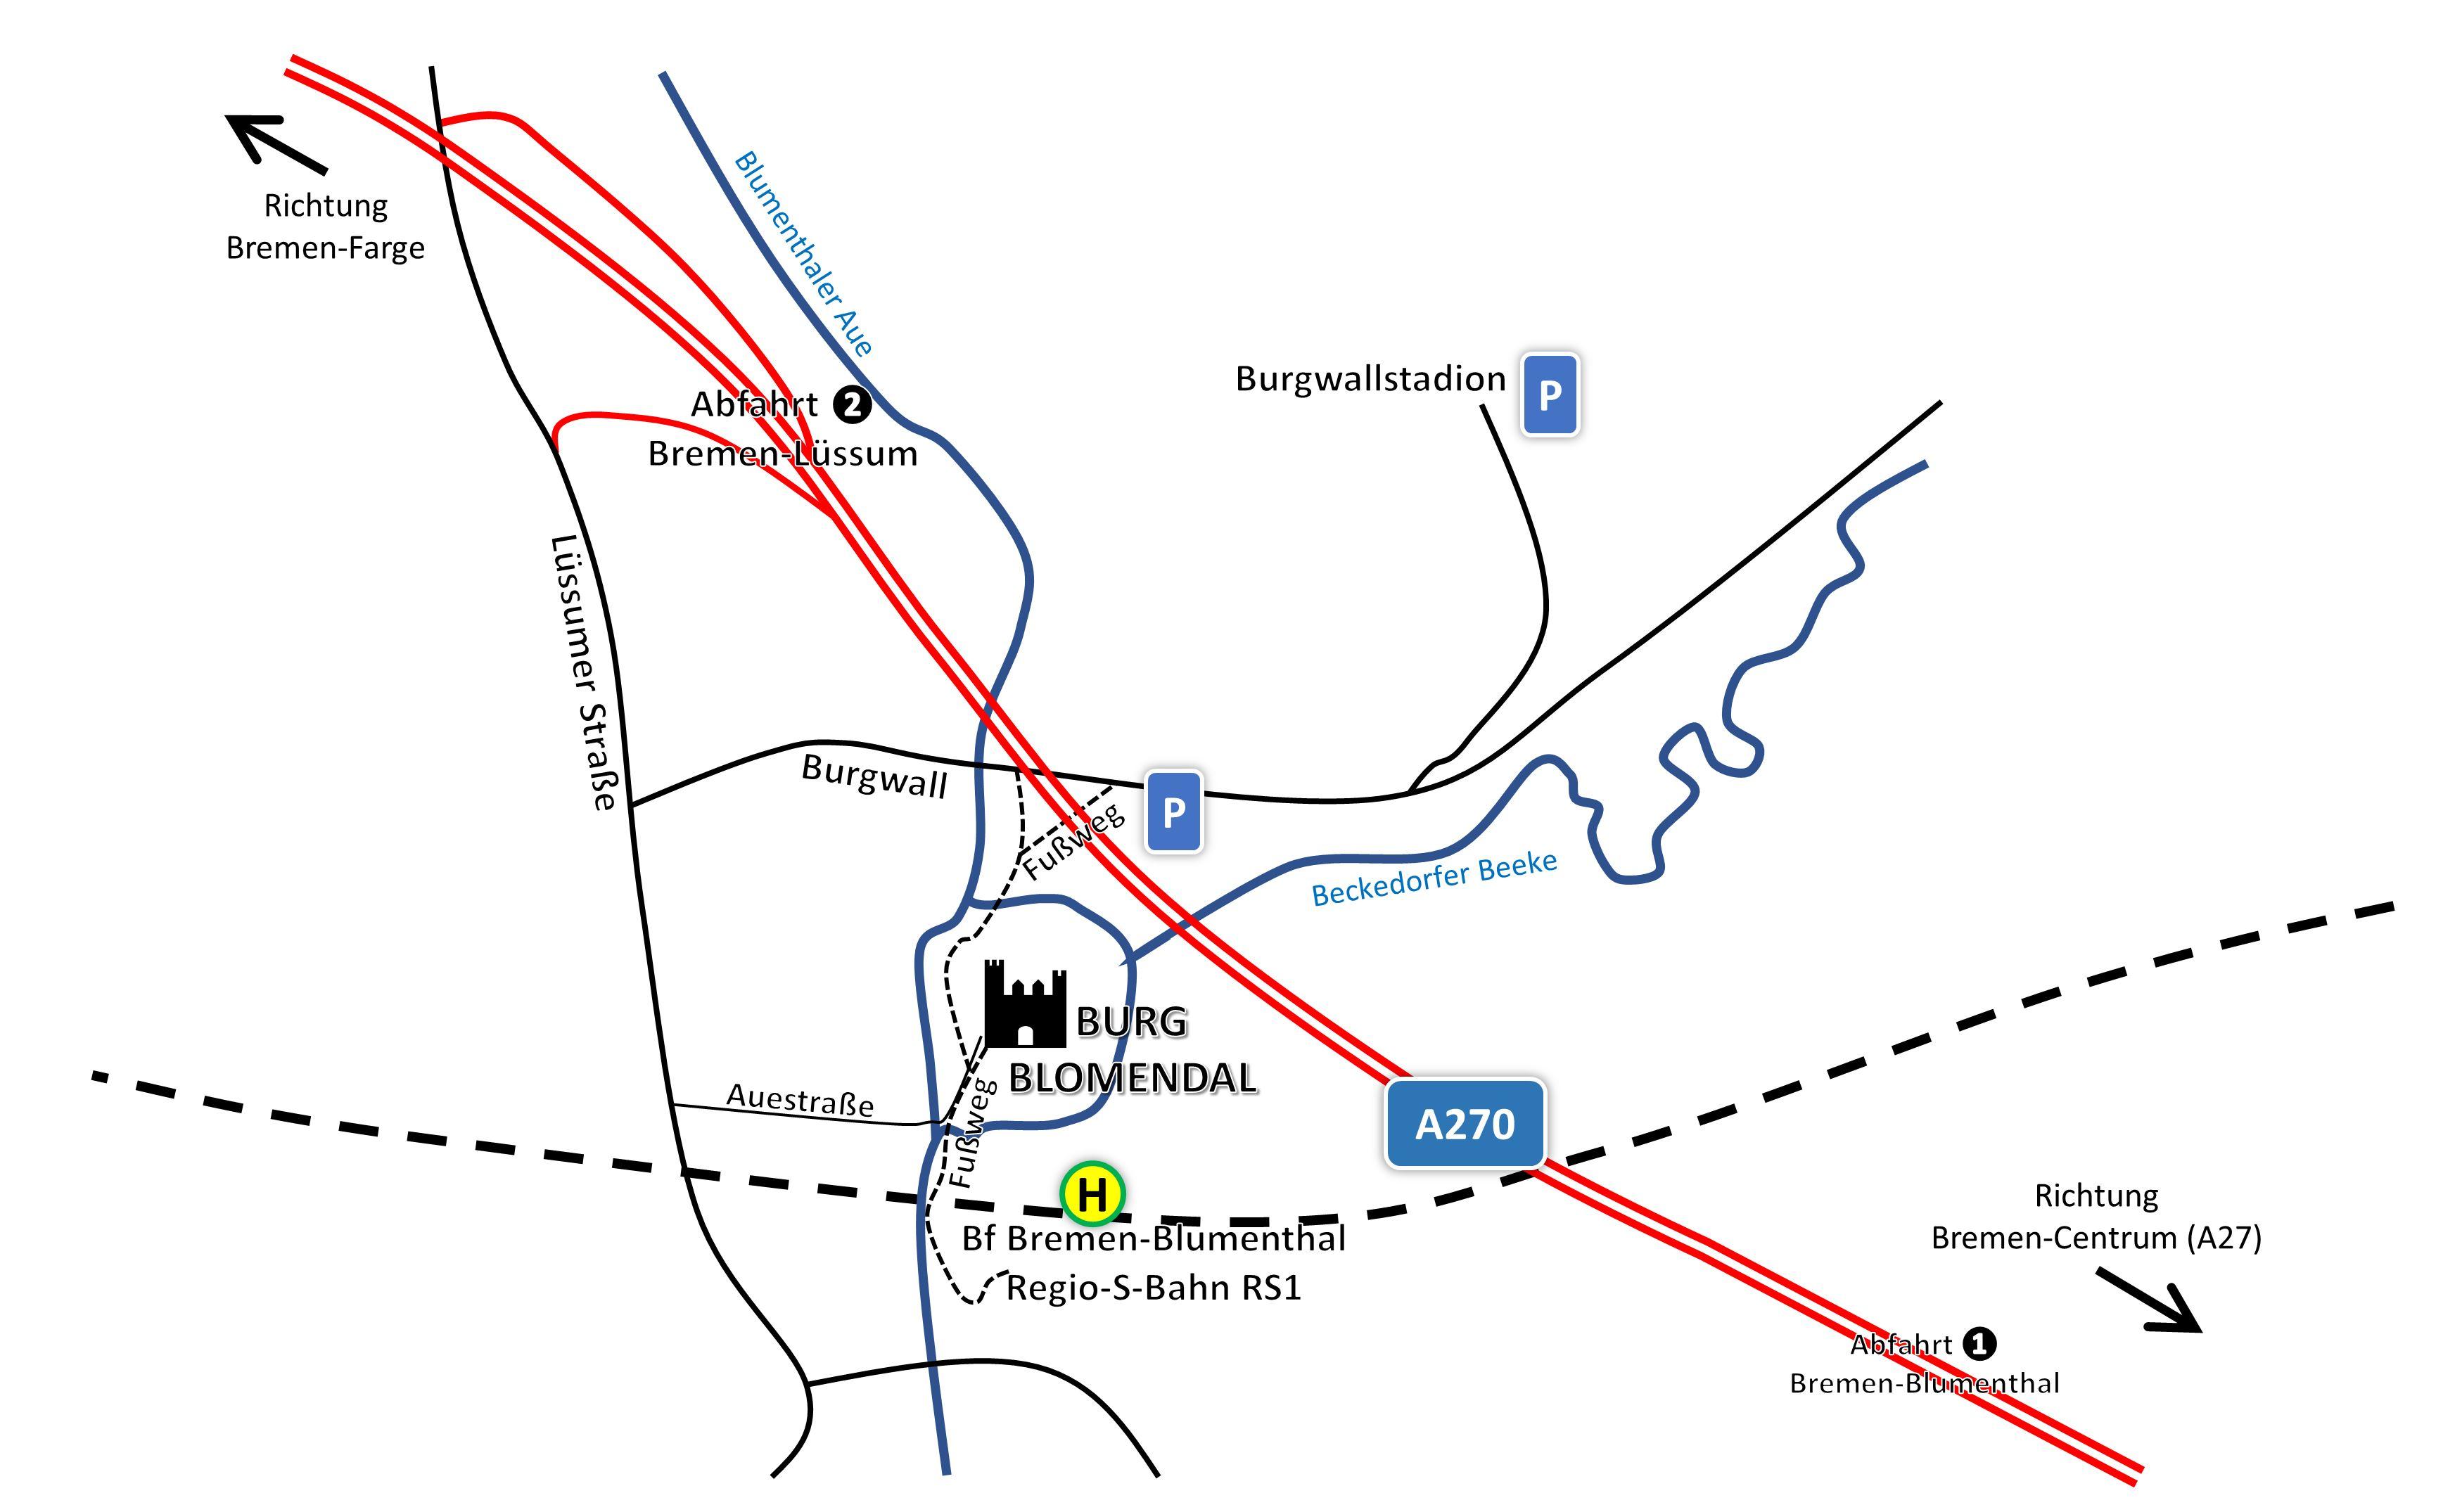 Anfahrtsskizze Burg Blomendal